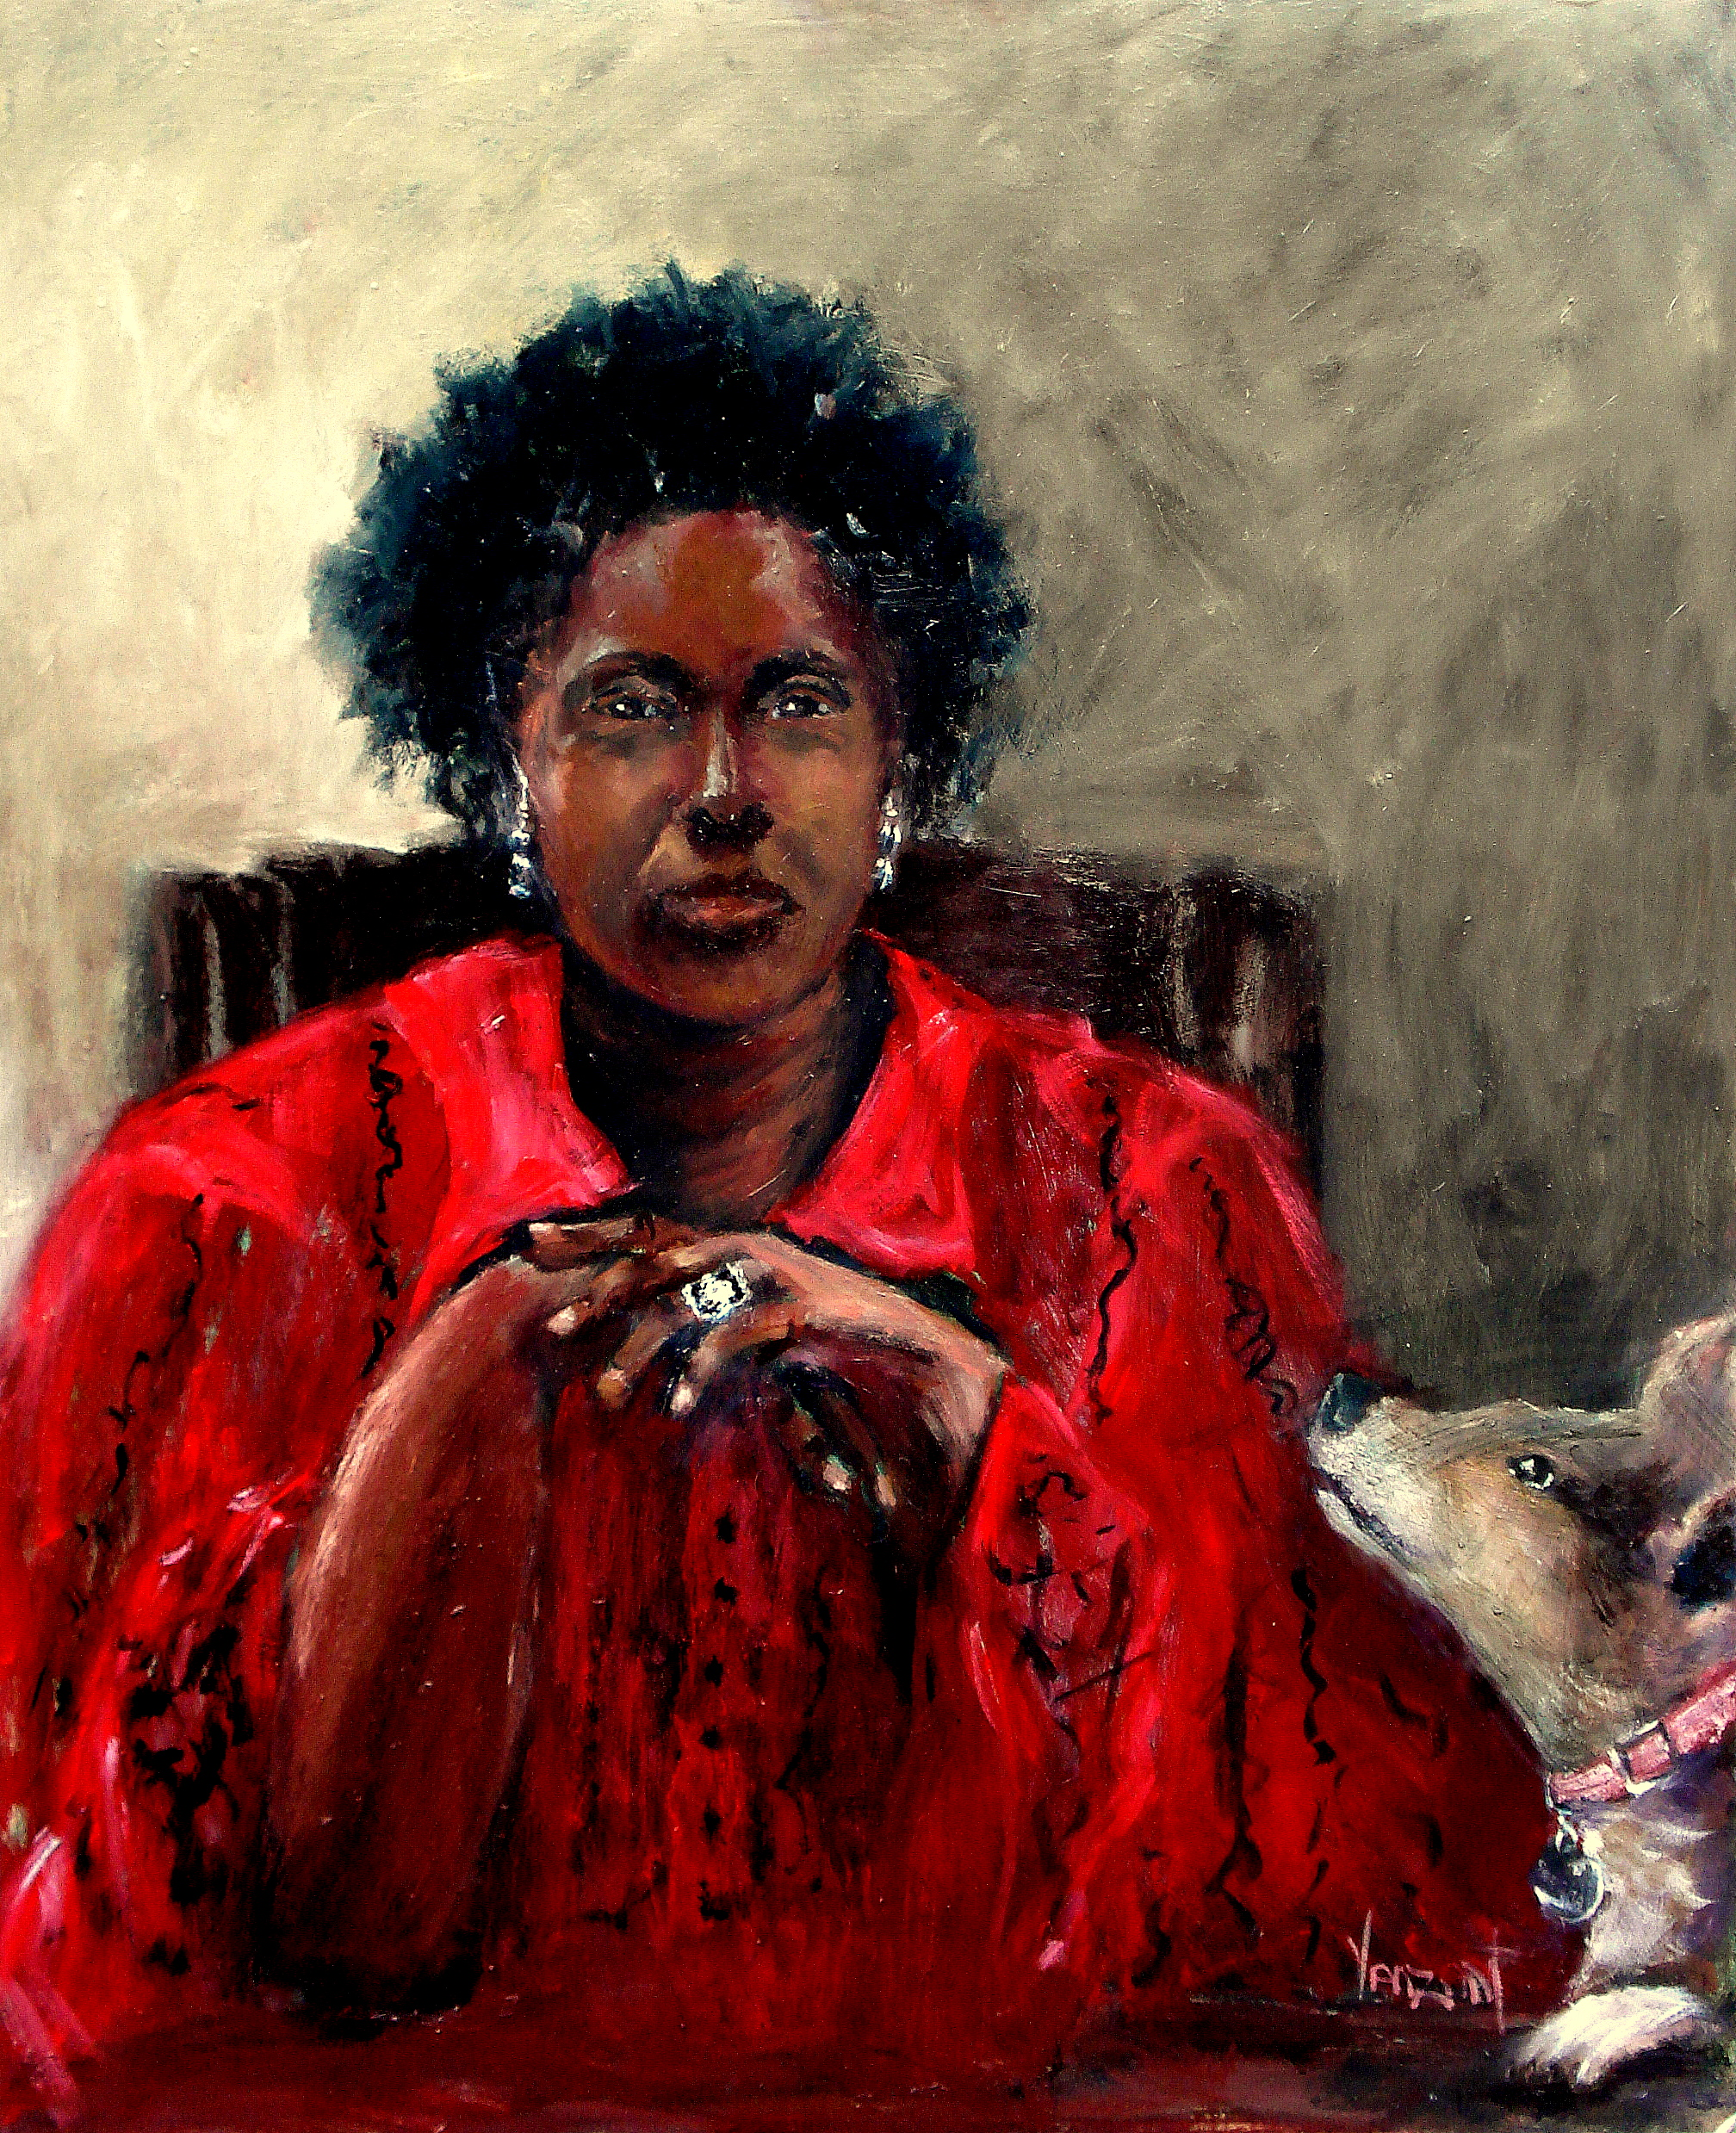 Self-Portrait with Serena 2014